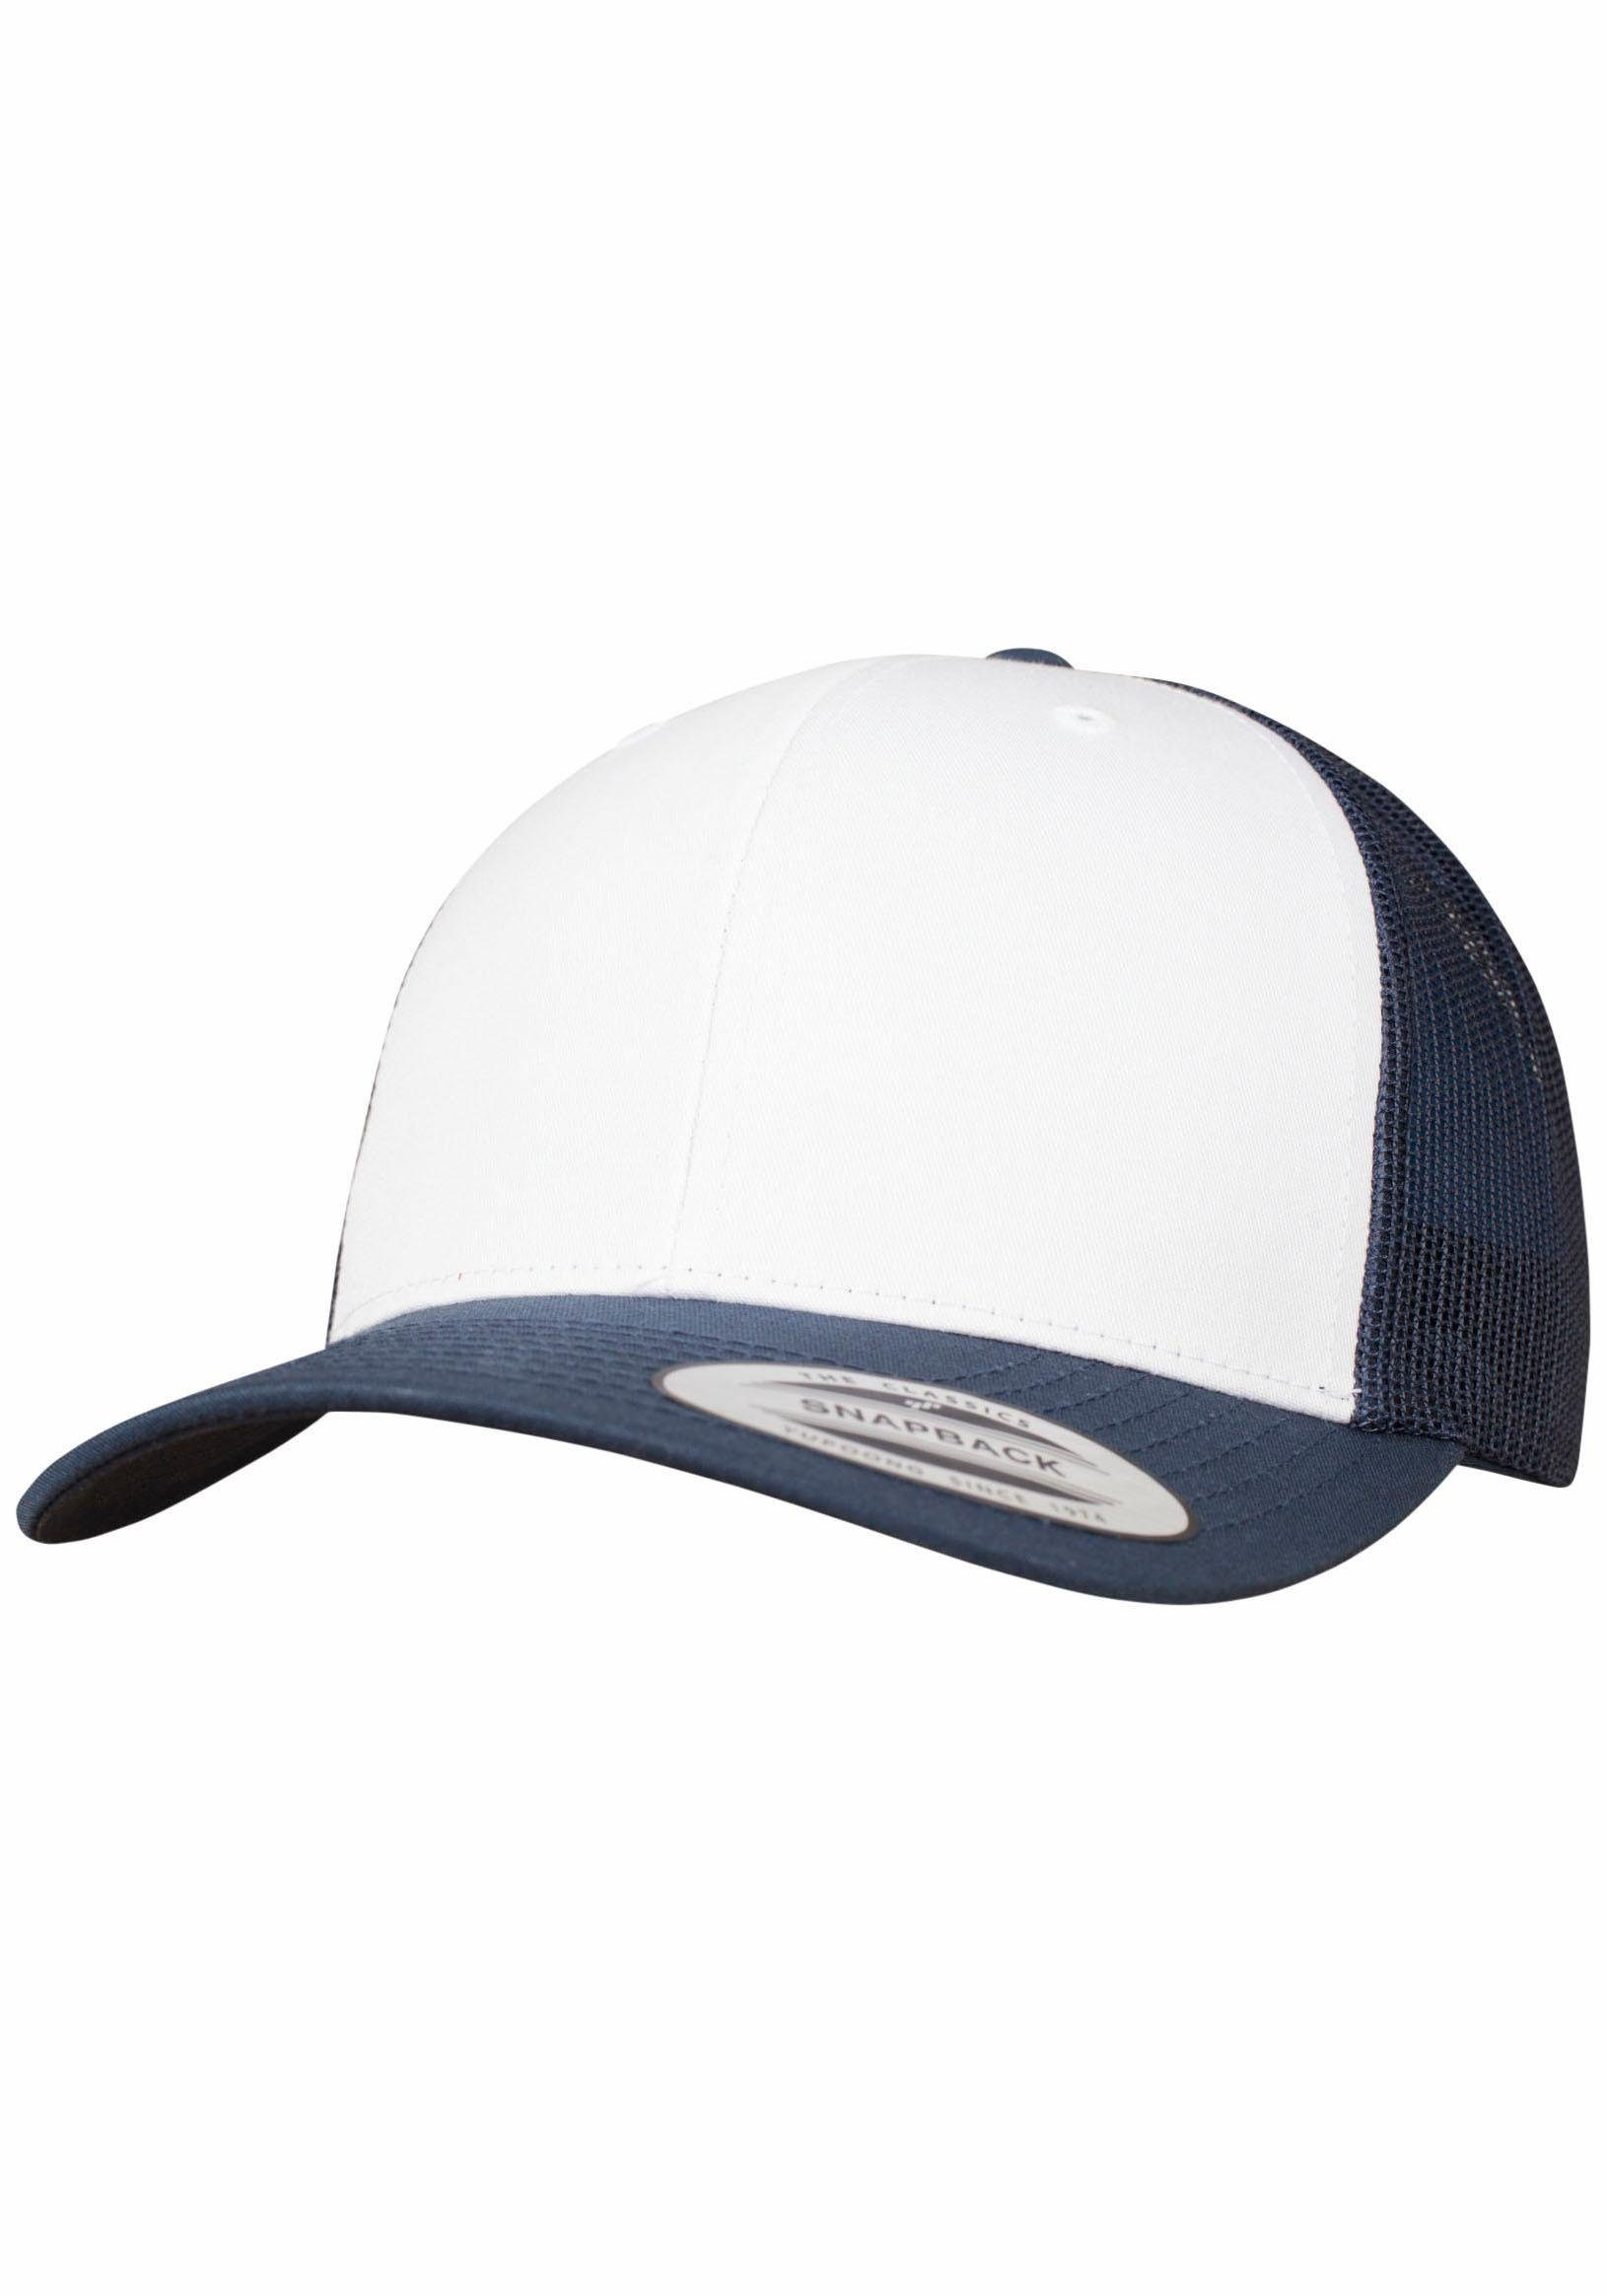 Baseball Cap Retro Trucker Colored Front, Snapback Style